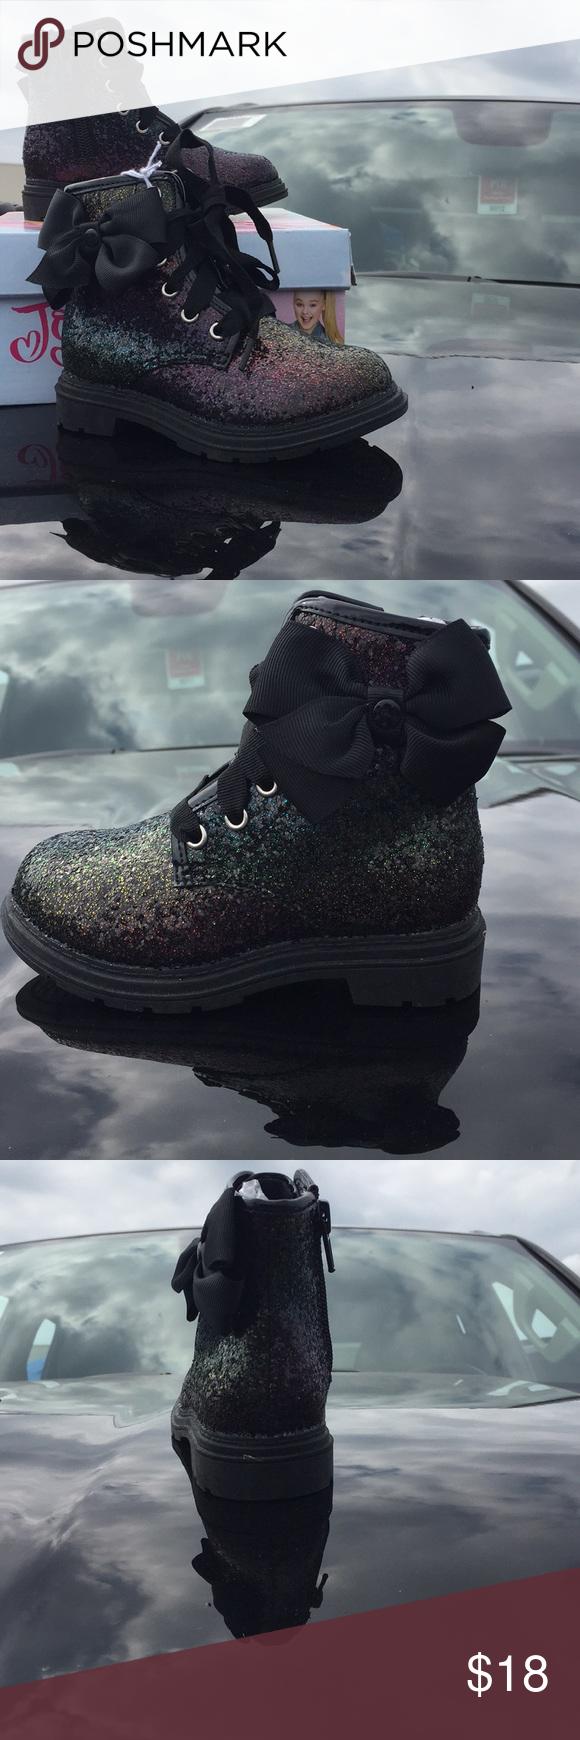 SALE Jojo siwa combat boots size